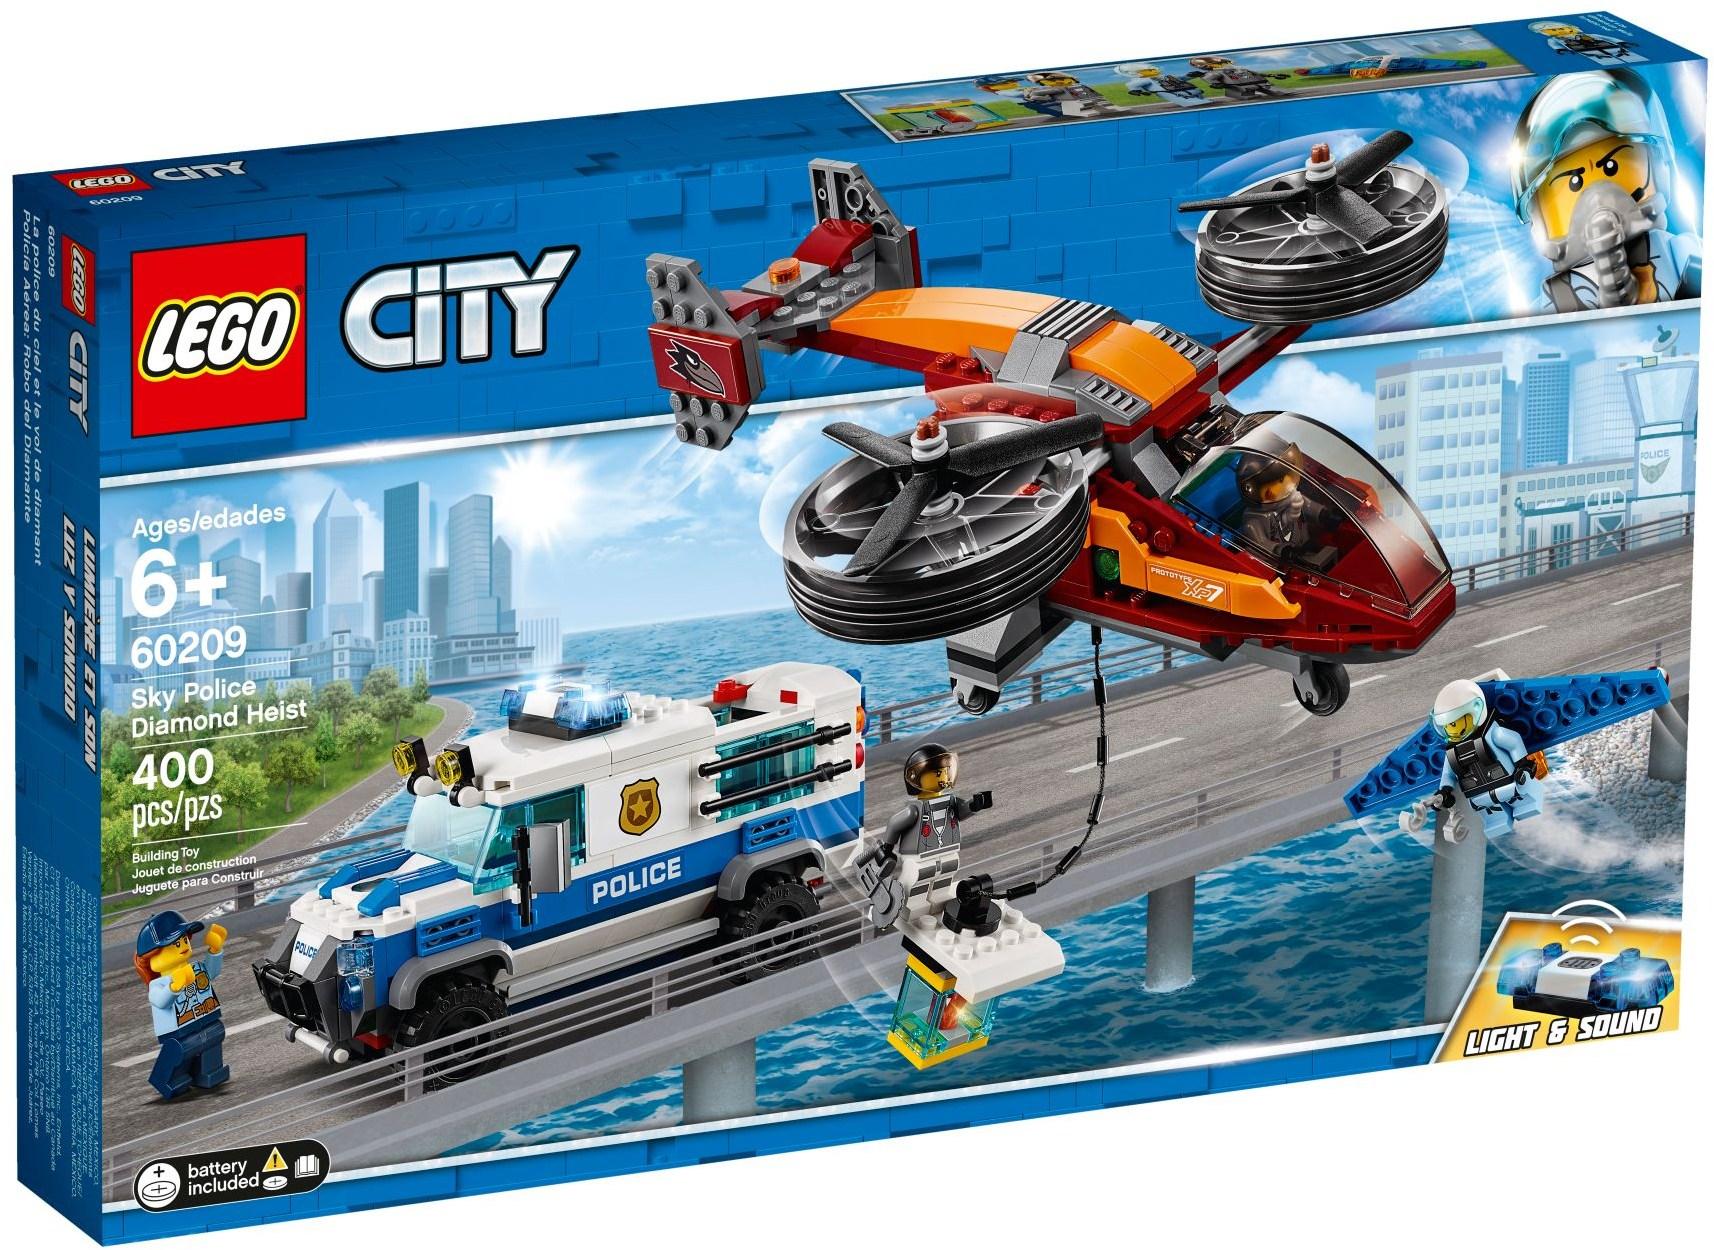 LEGO SKY POLICE DIAMOND HEIST - 60209